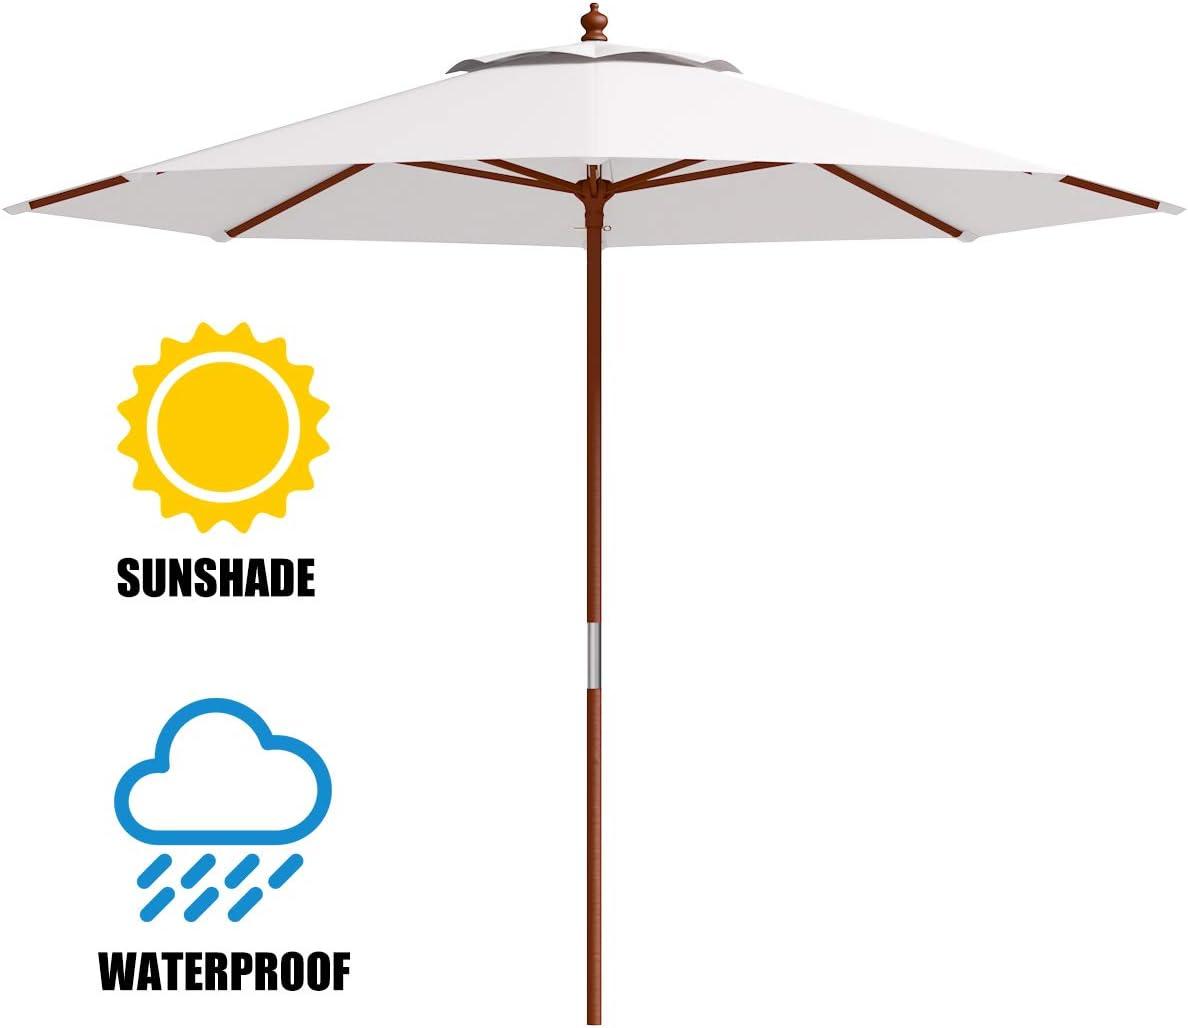 Tangkula Patio Umbrella Height Adjustable Wood Pole Outdoor Sun Shade Beige 10ft